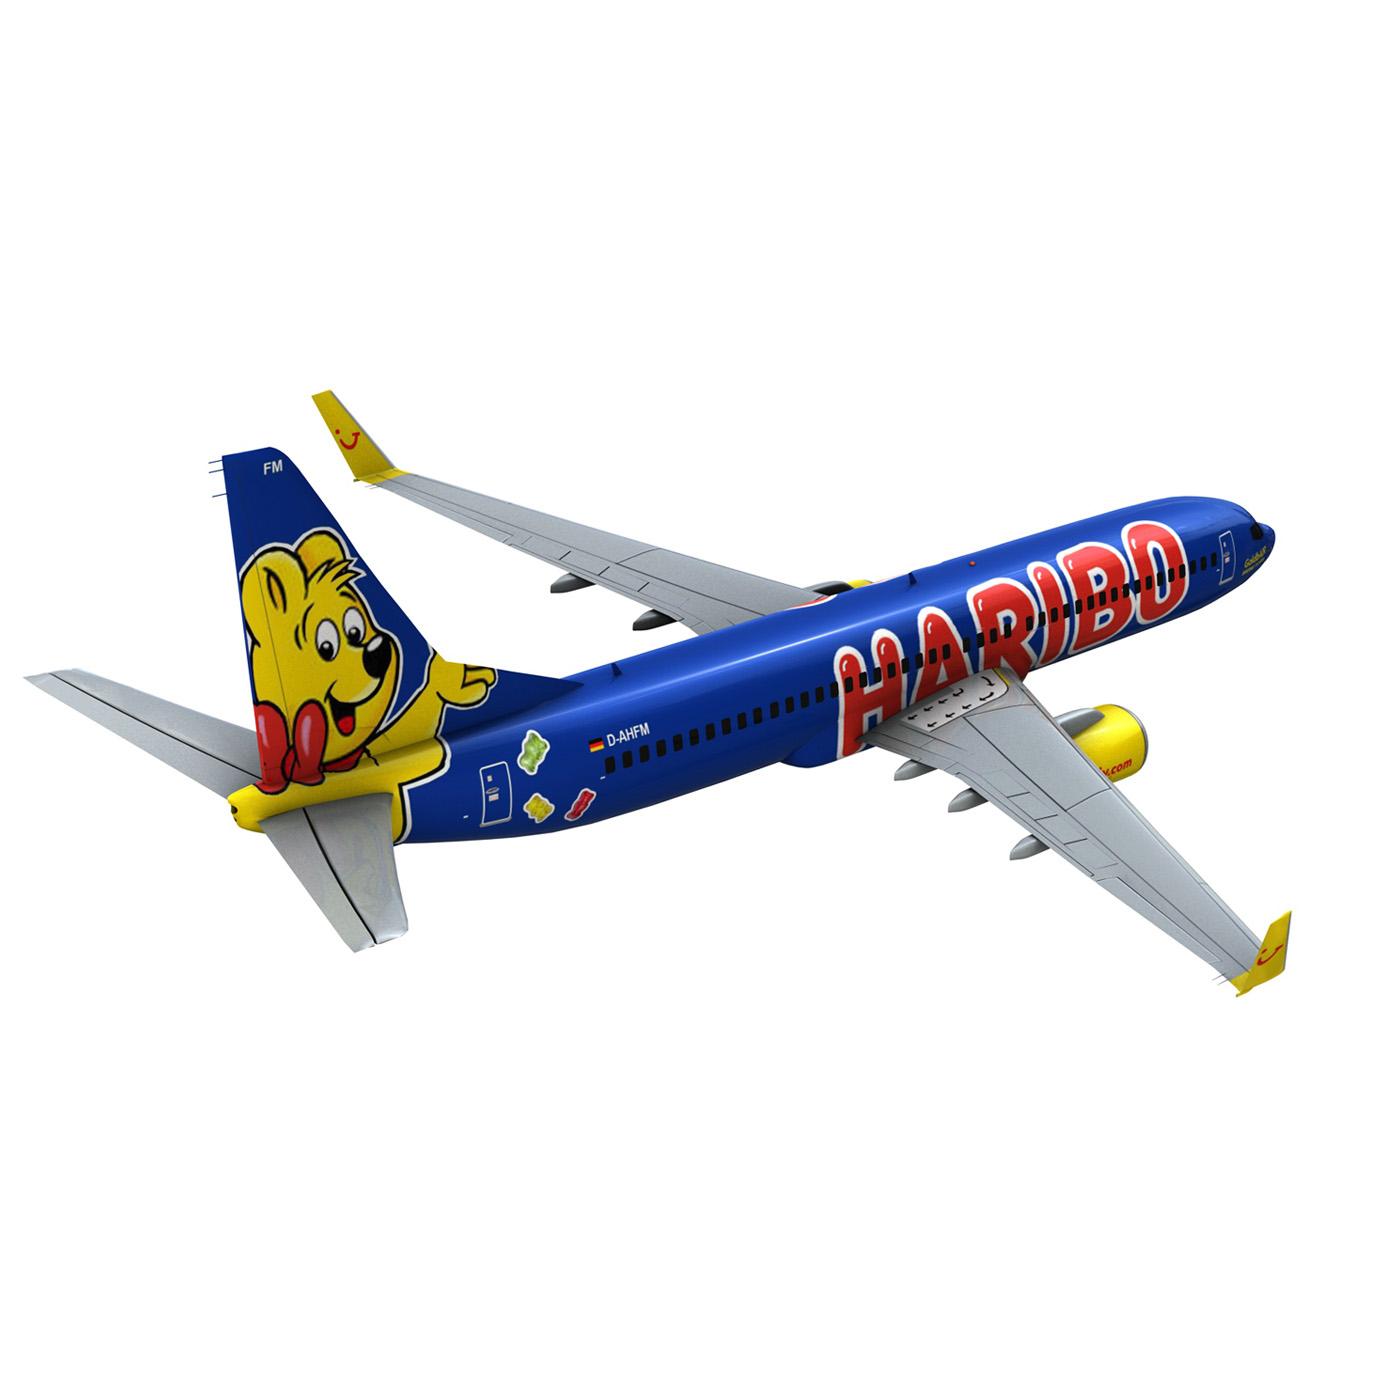 boeing 737-800 goldbair 3d model 3ds fbx c4d lwo obj 293503